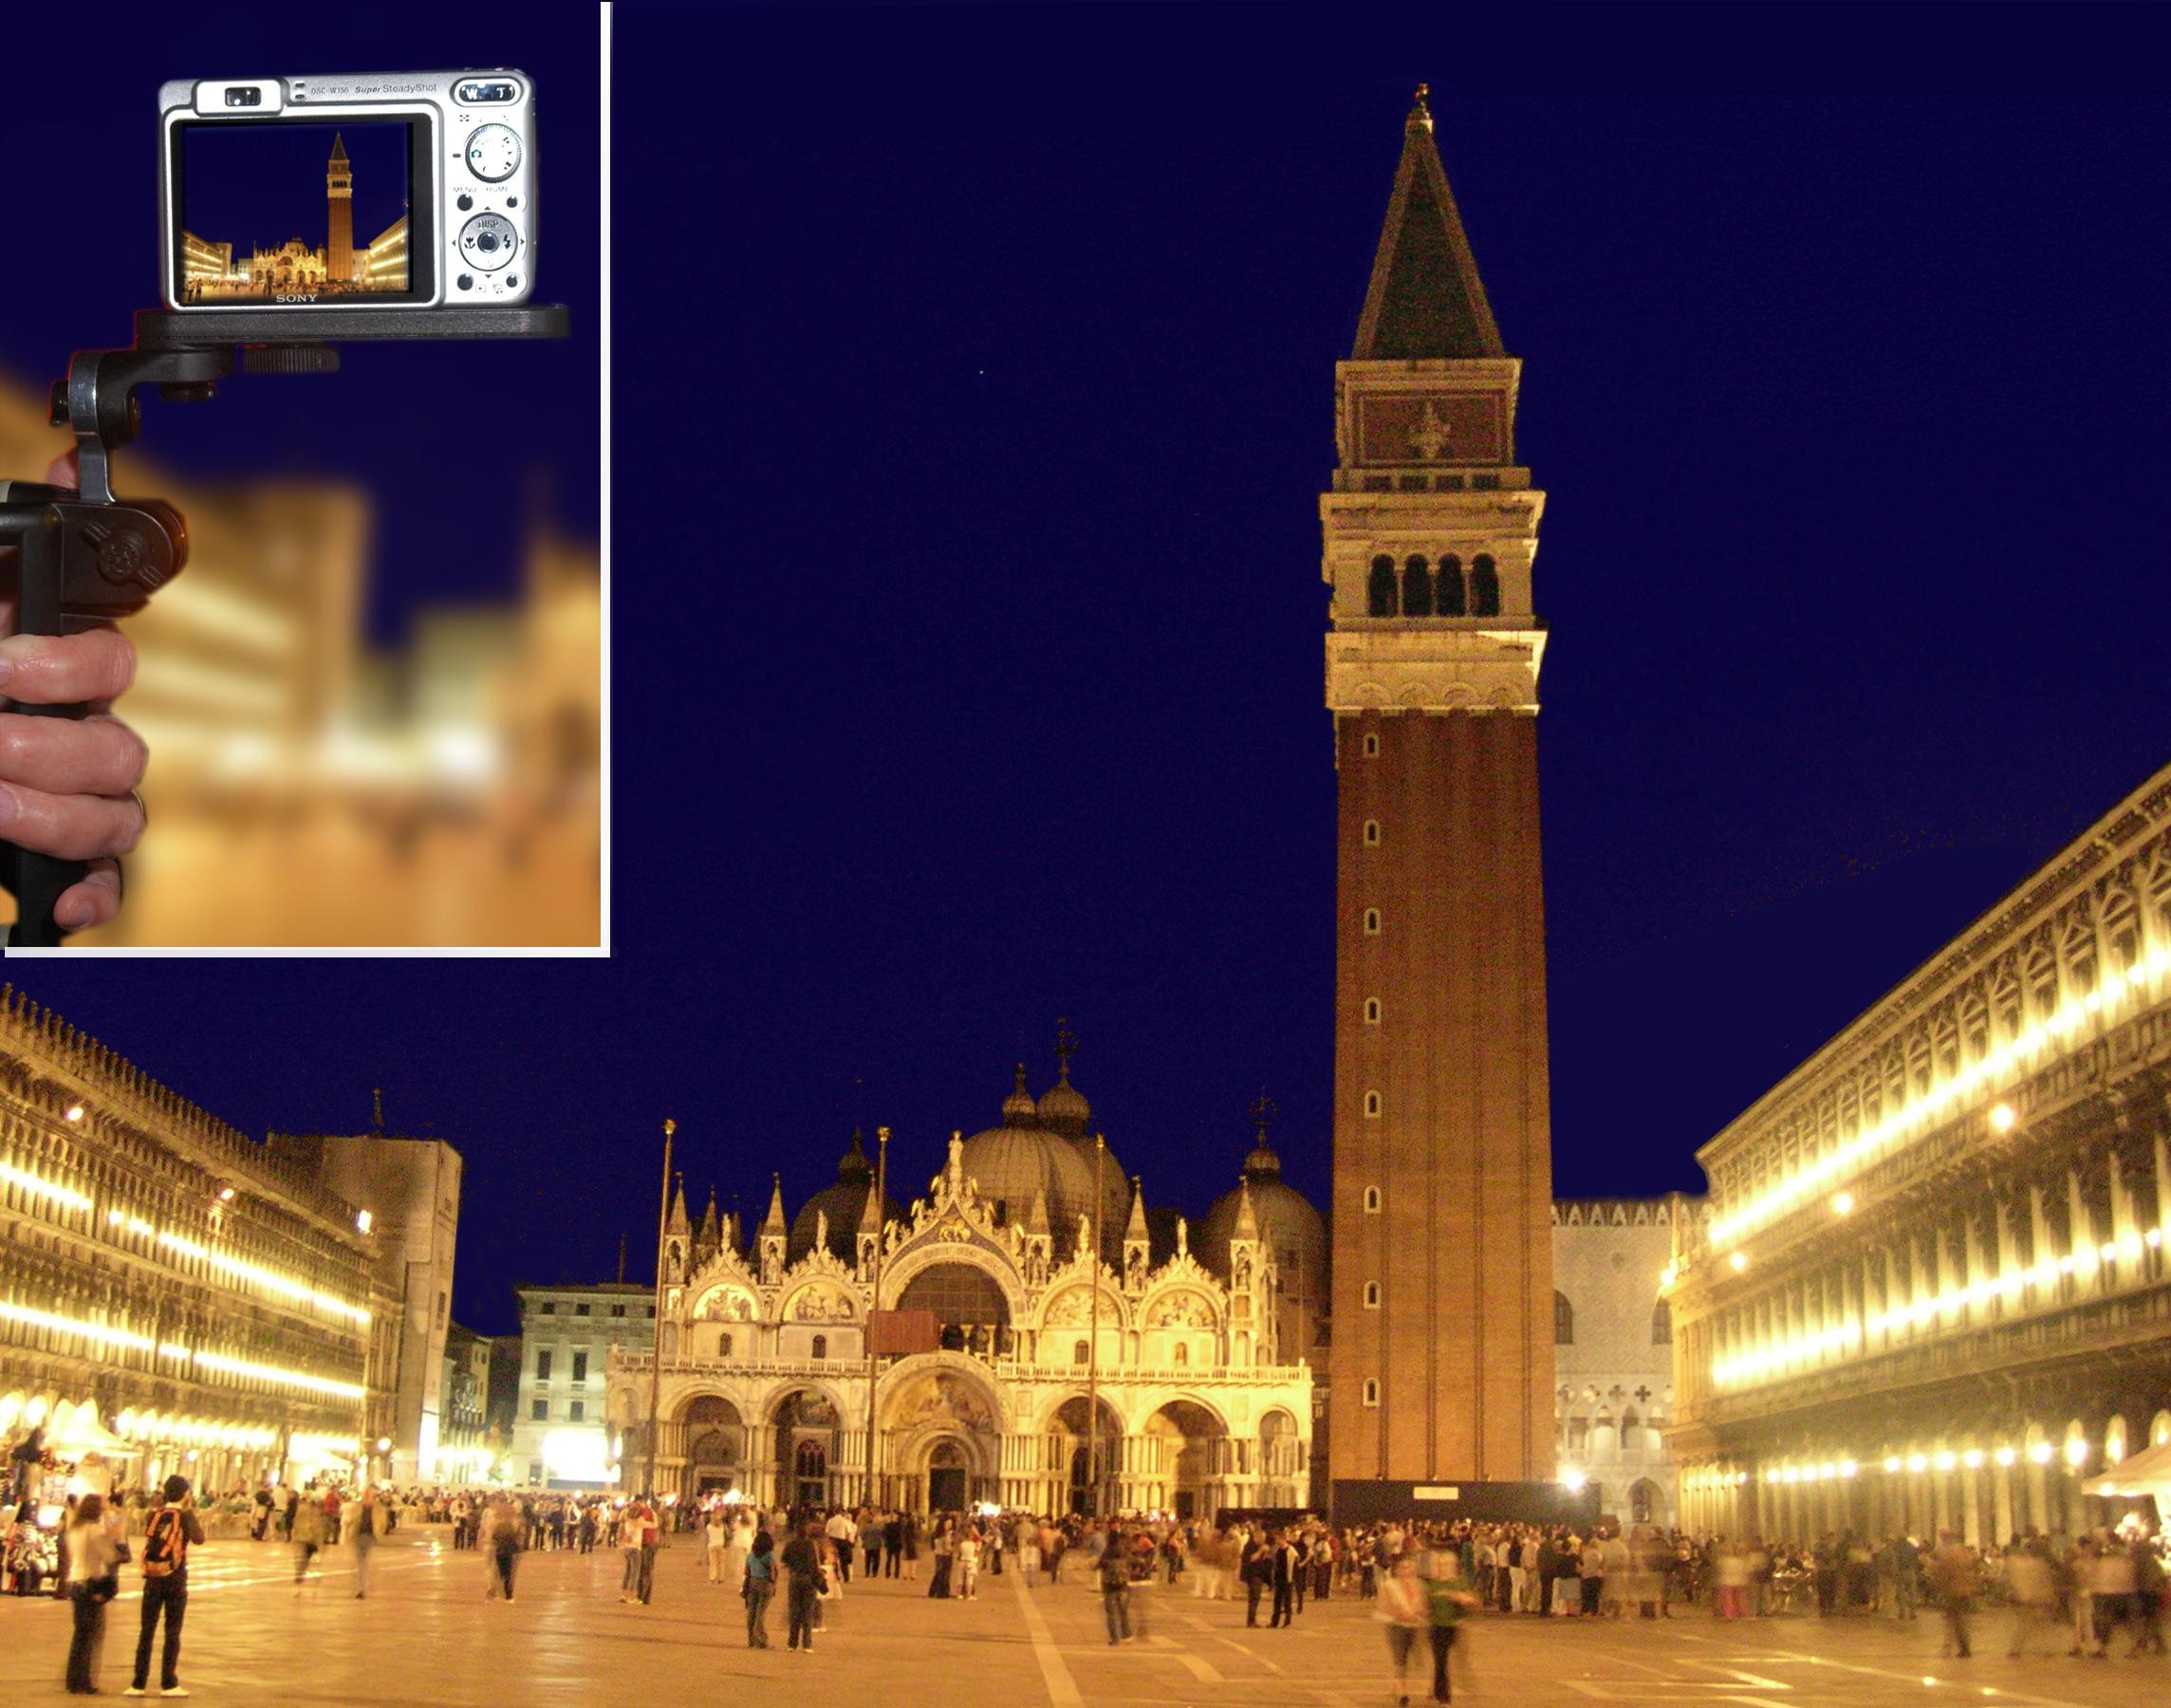 San Marco Night HandlePod insert image